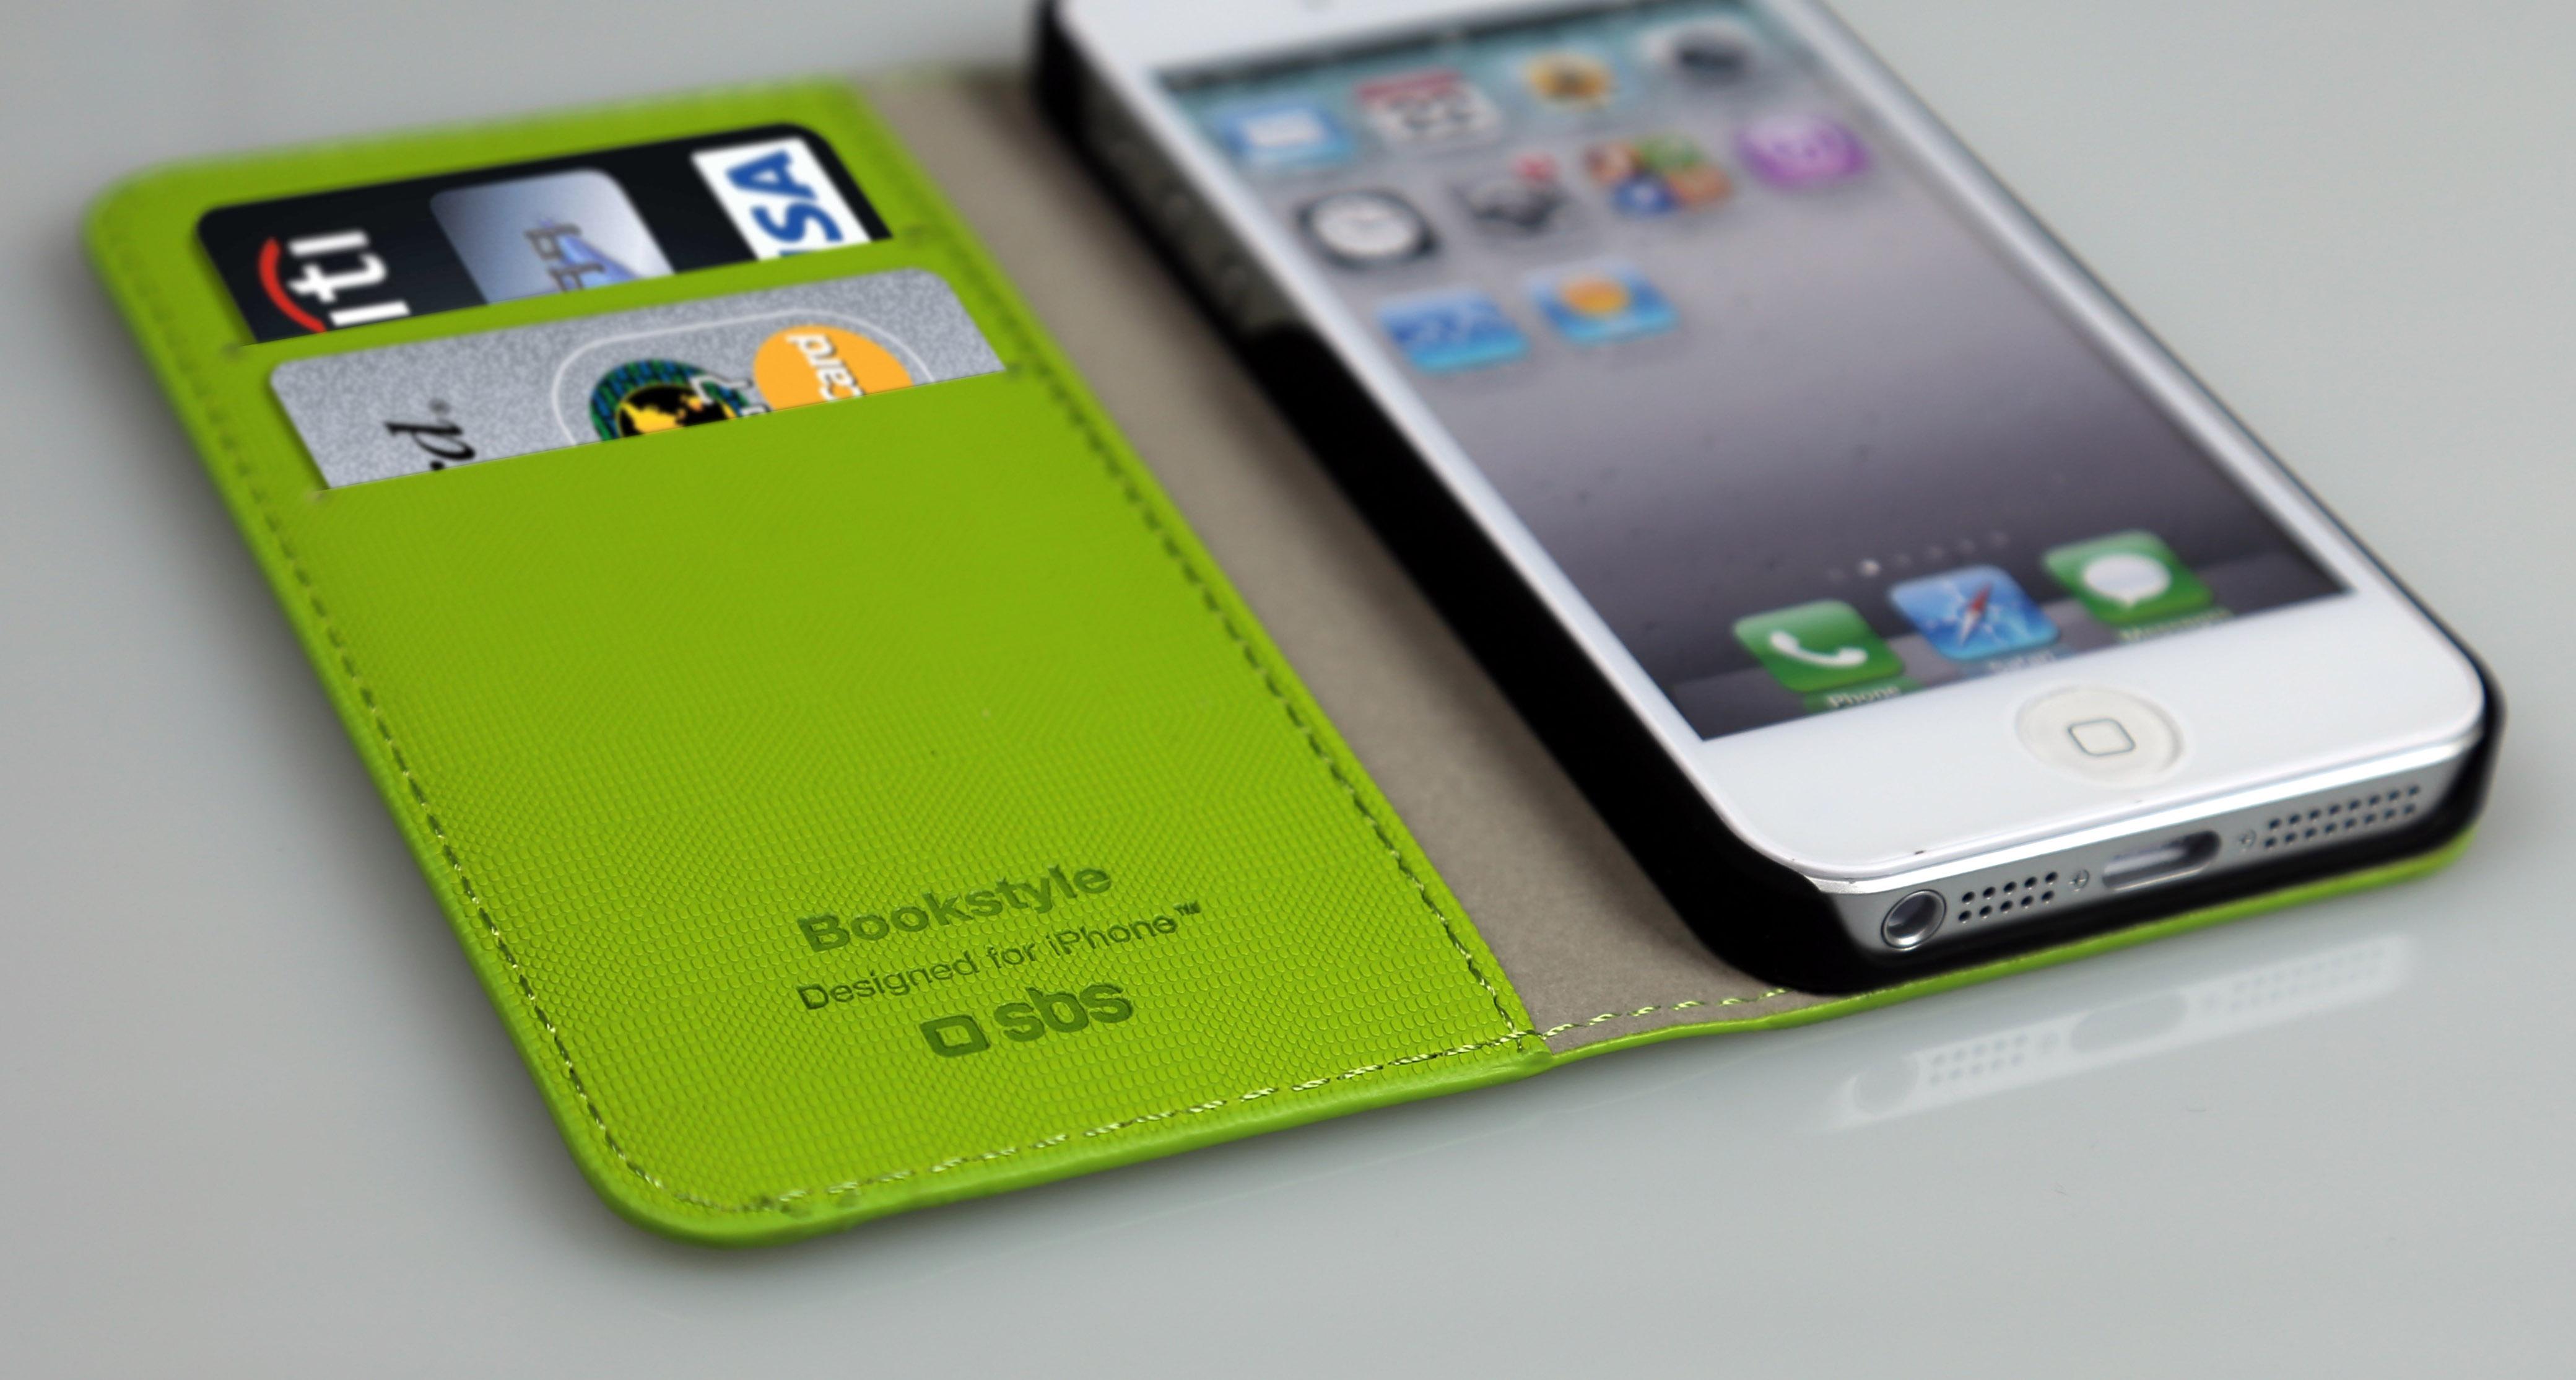 regalo iphone 4